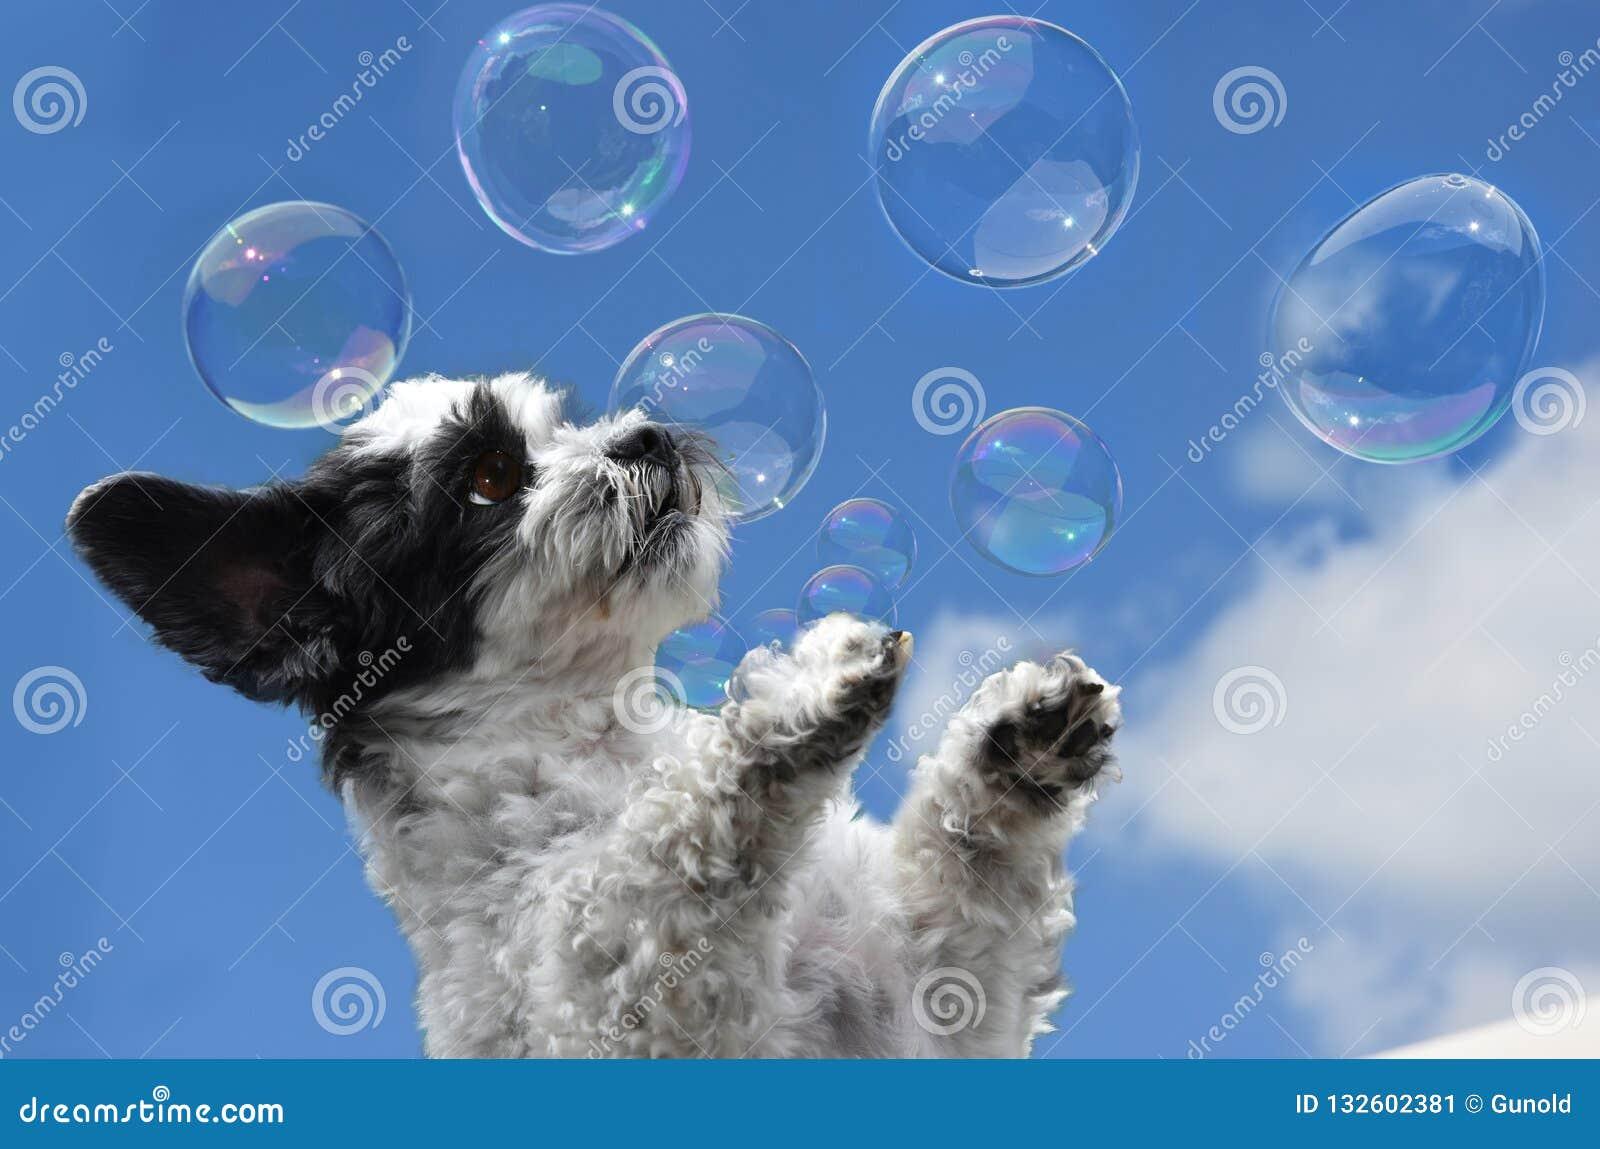 Cute little dog tries to catch soap bubbles